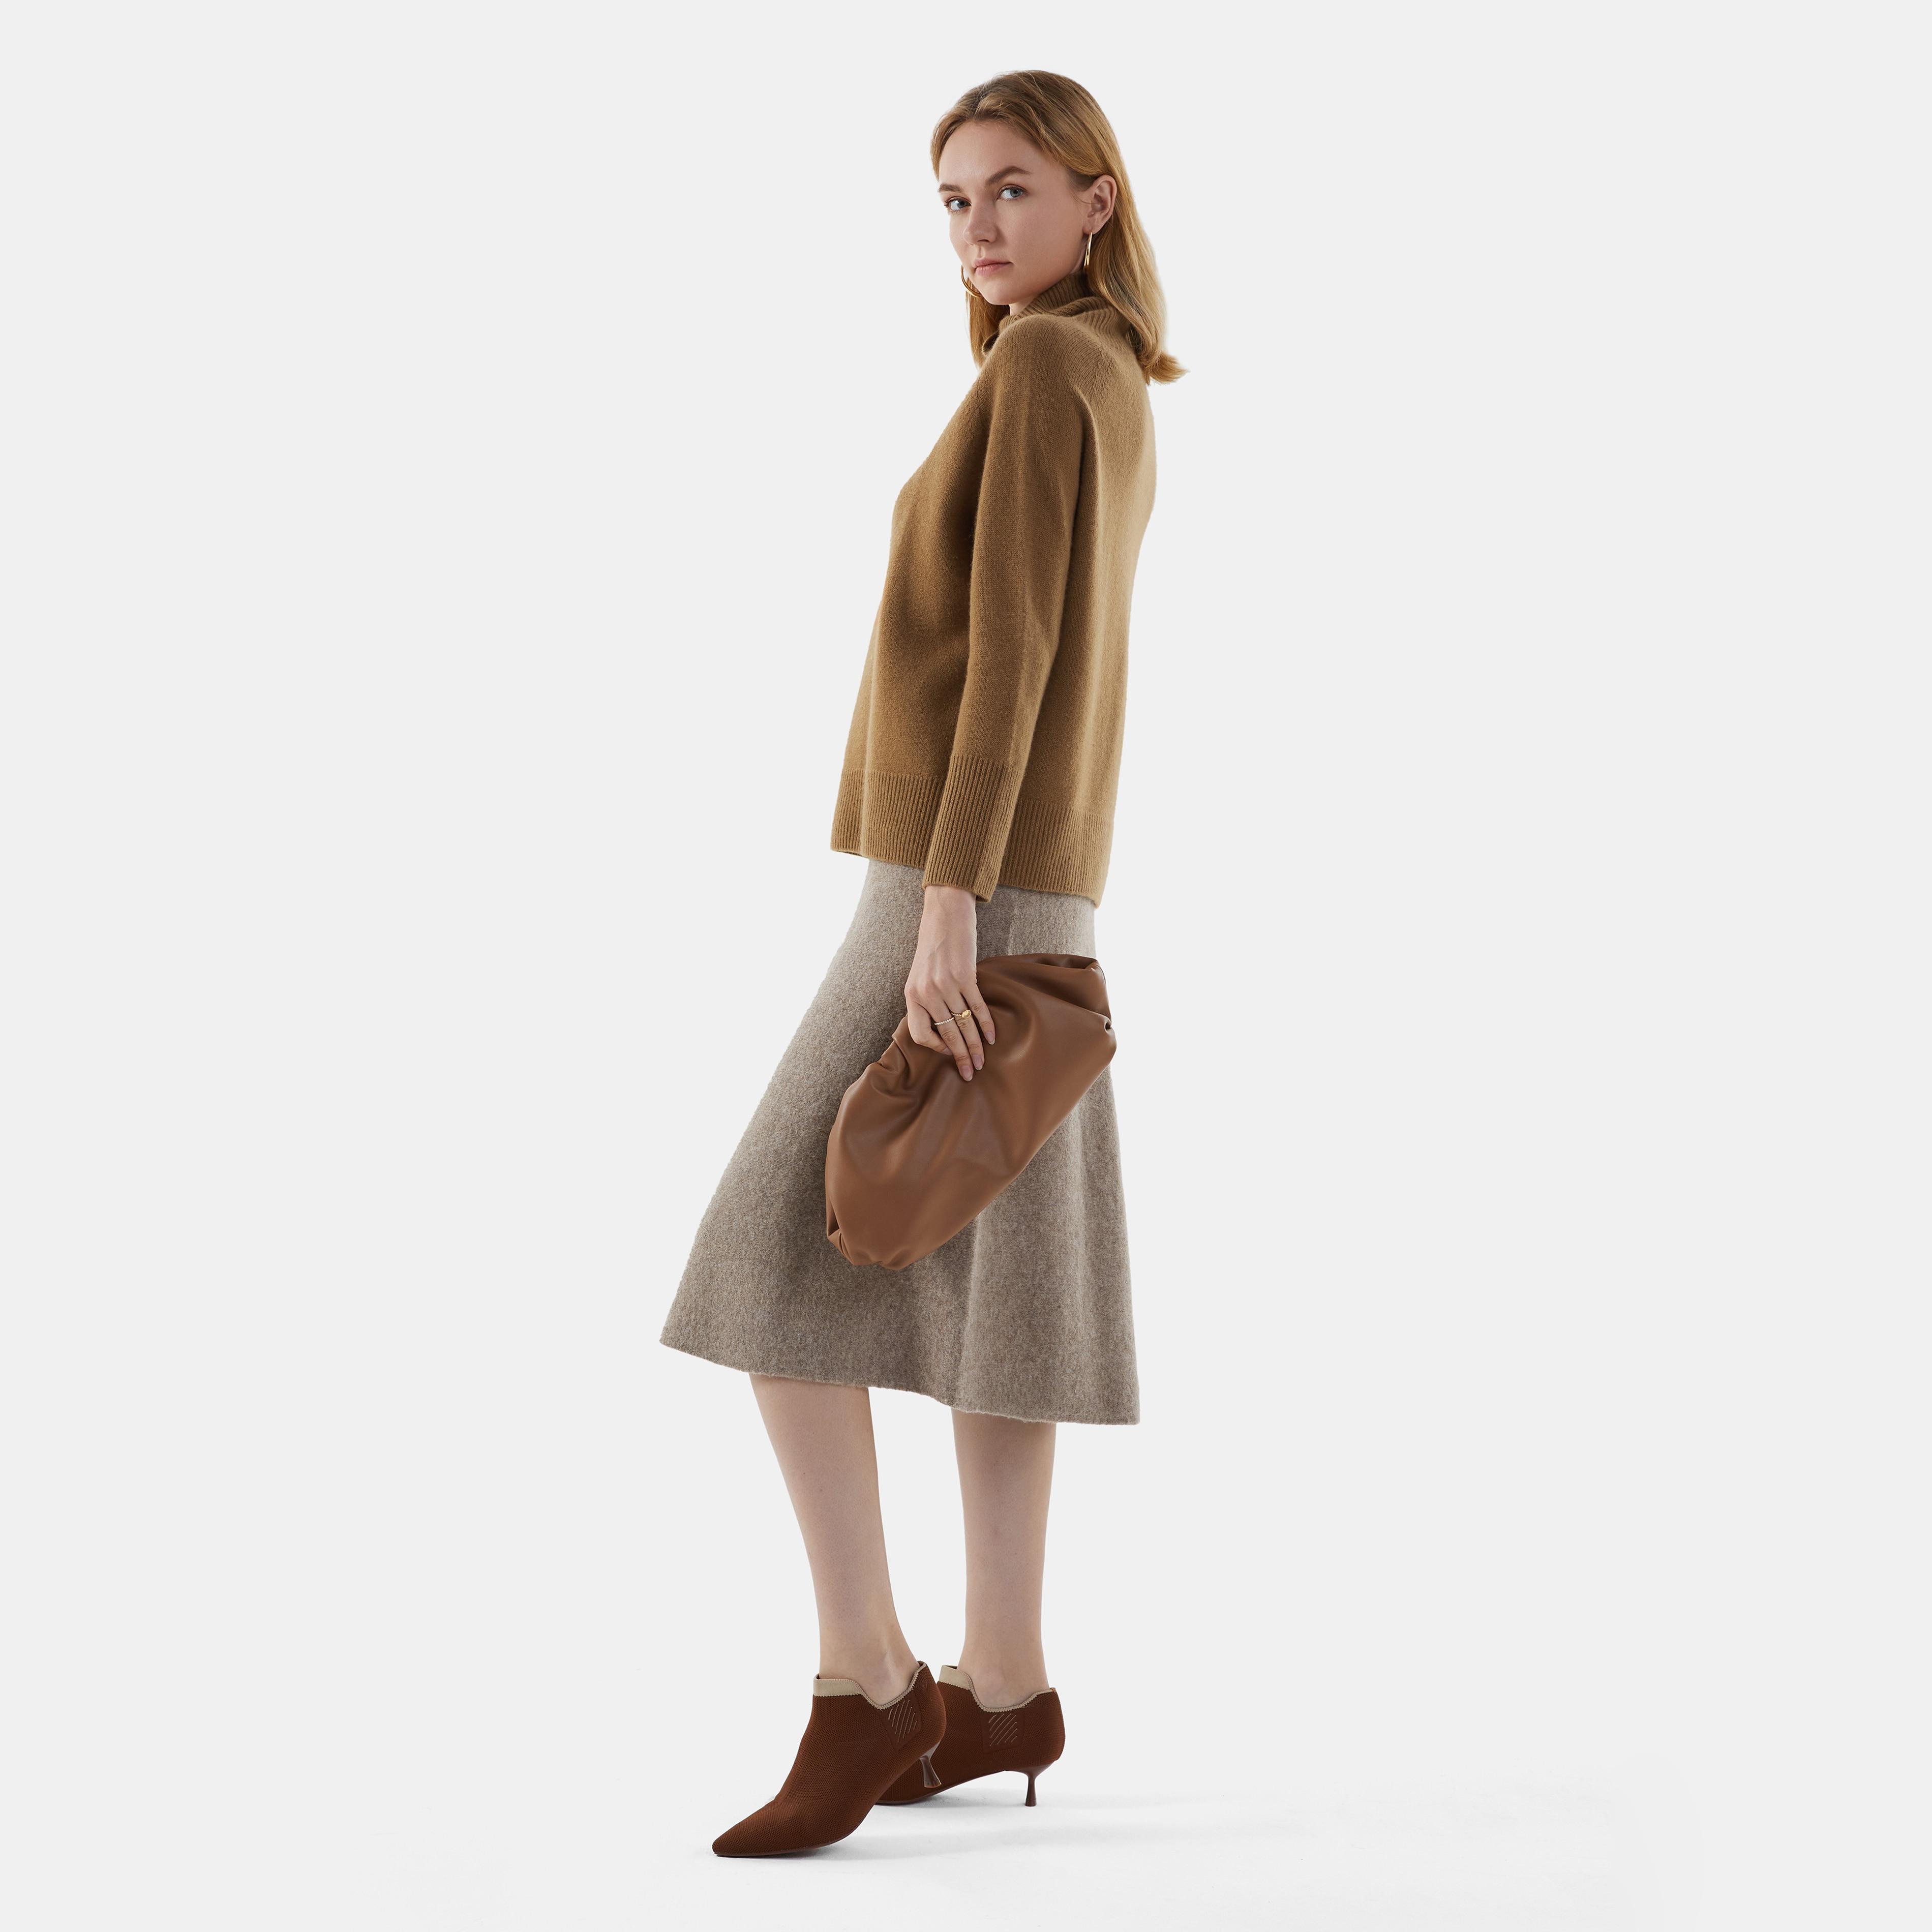 Cashmere Turtle Neck Sweater-Caramel Brown - Caramel Brown S